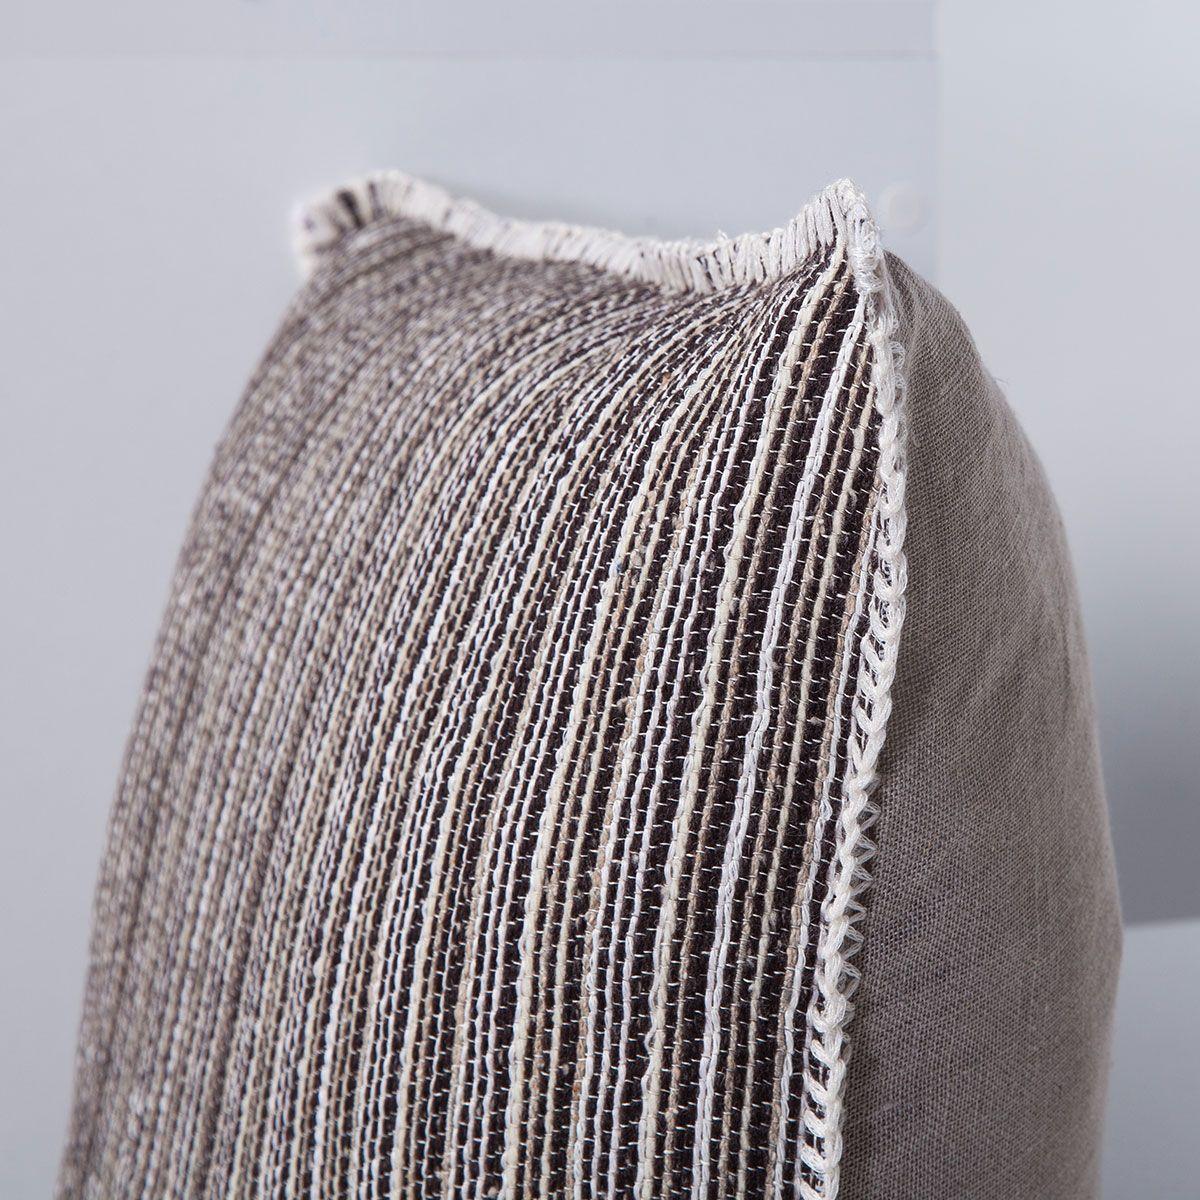 Cushion Wool / Ala - D93 - 50 x 50 cm